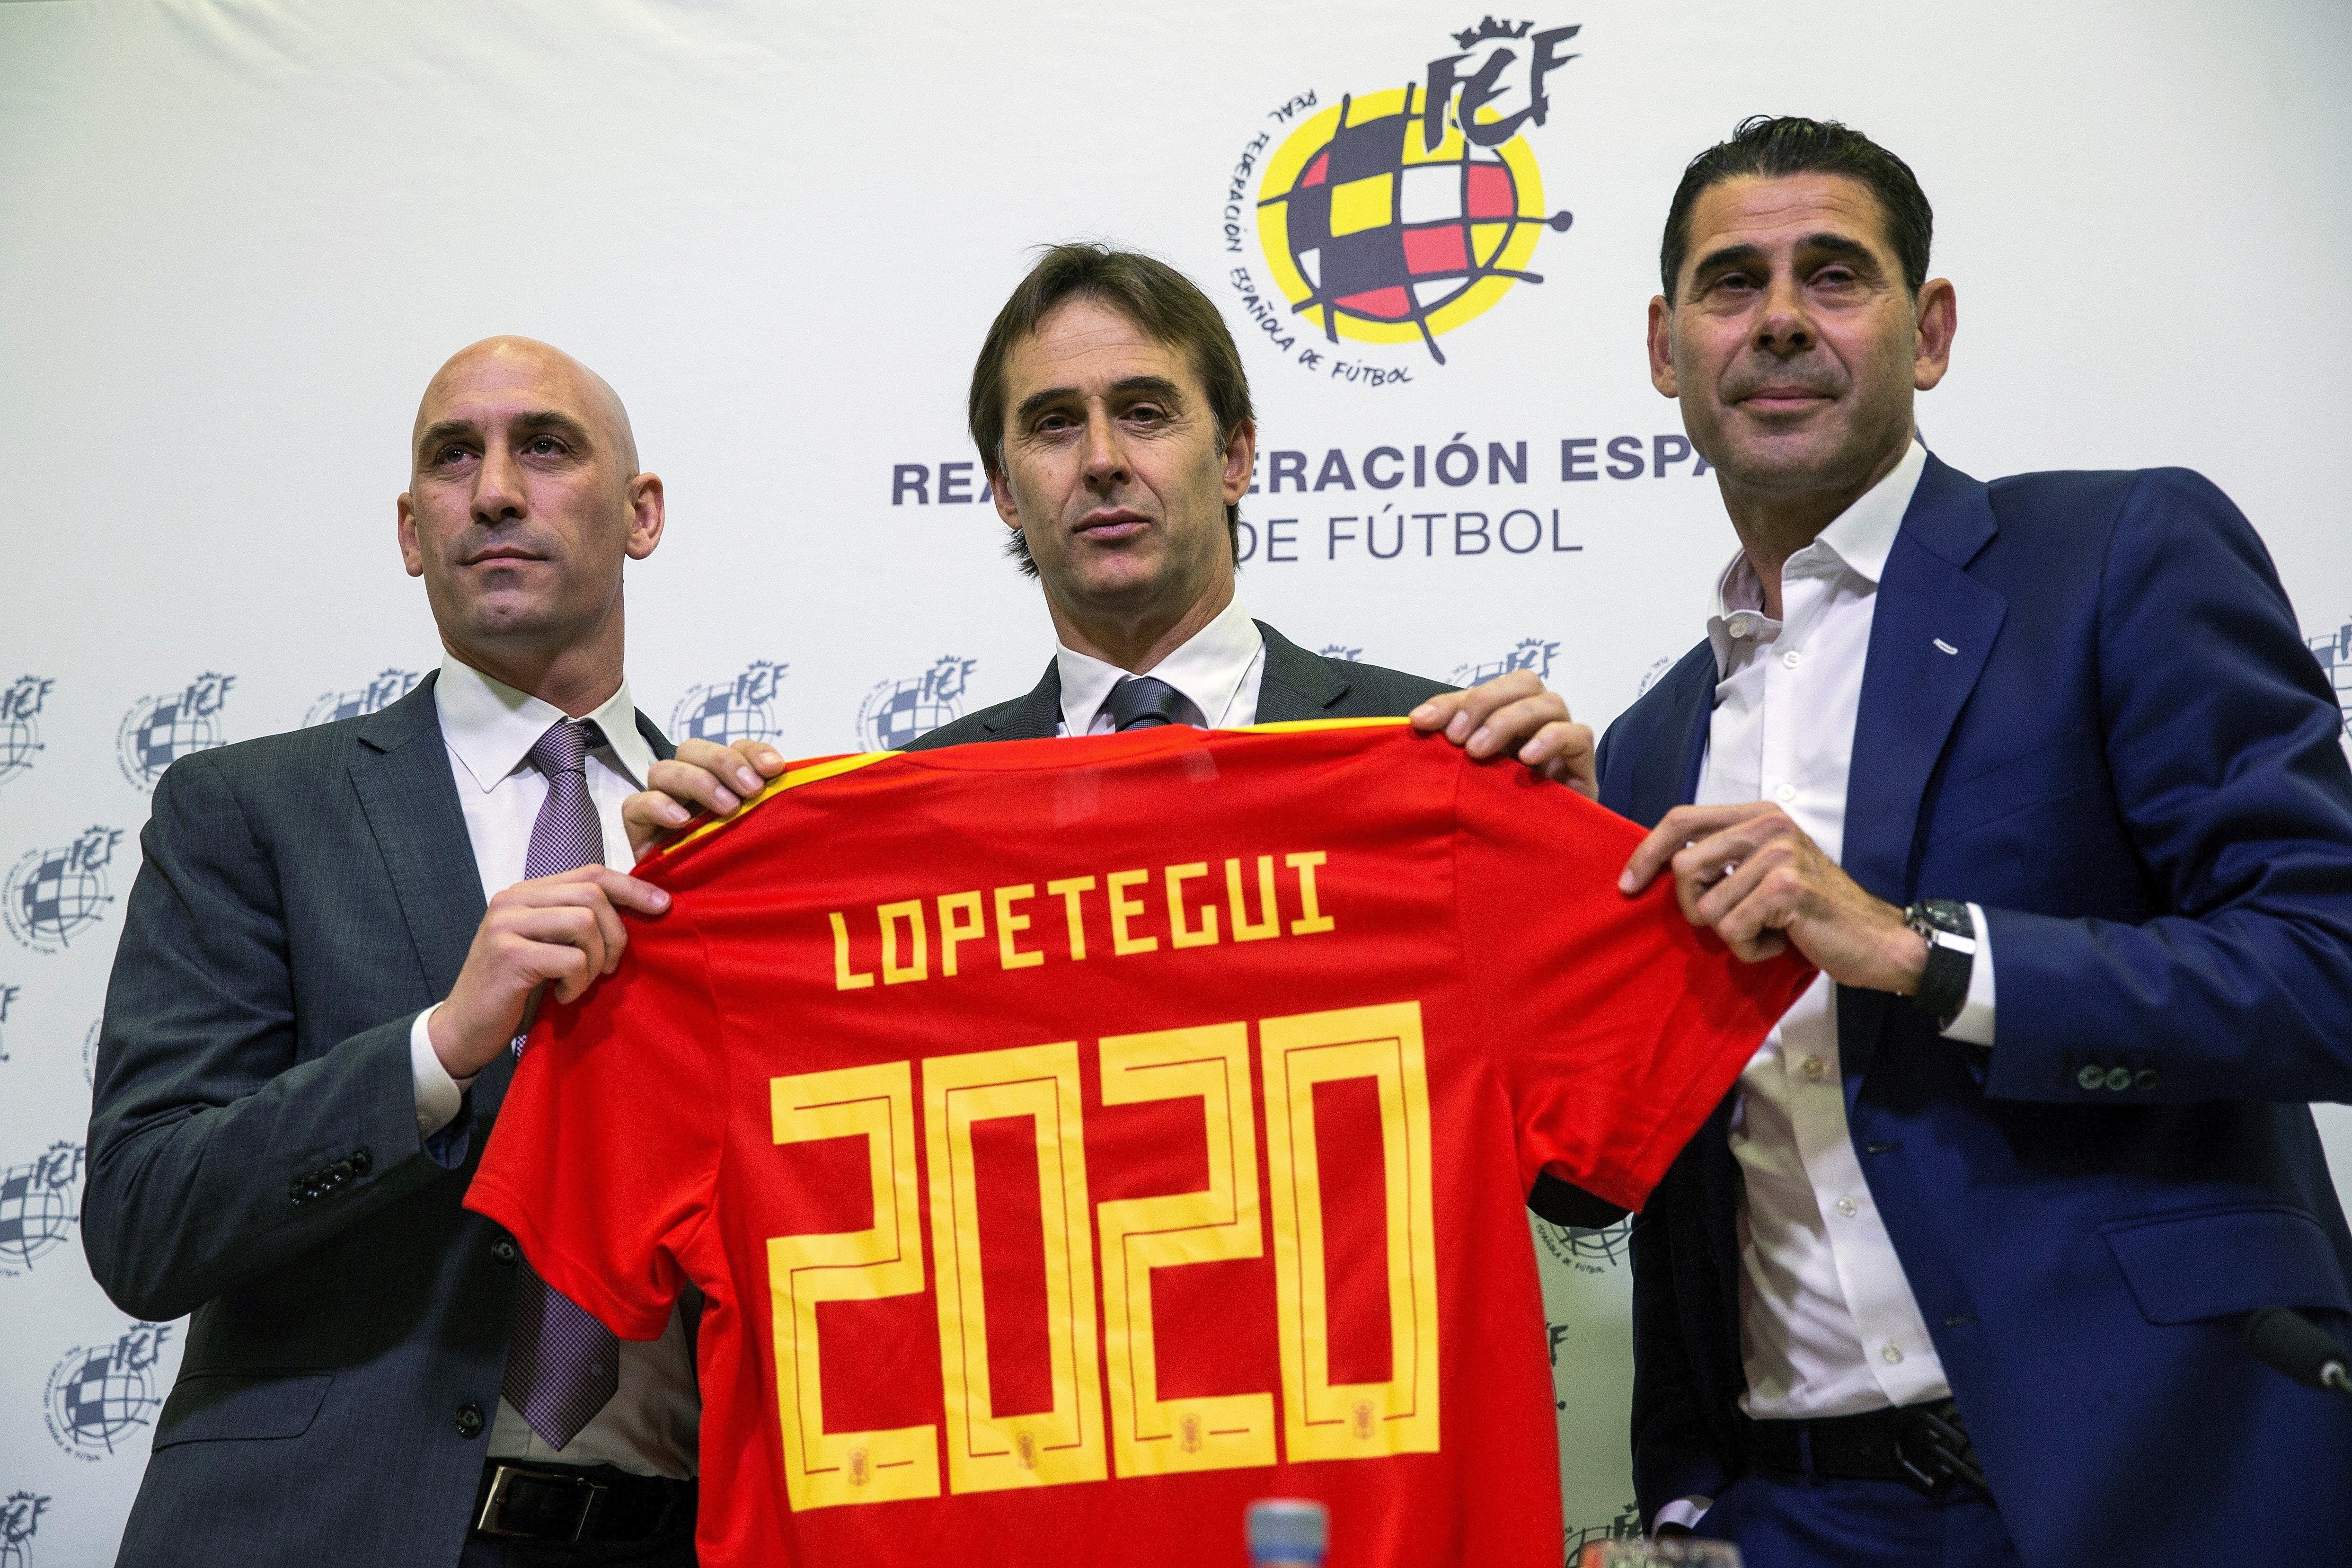 https://i.eurosport.com/2018/05/22/2340474.jpg